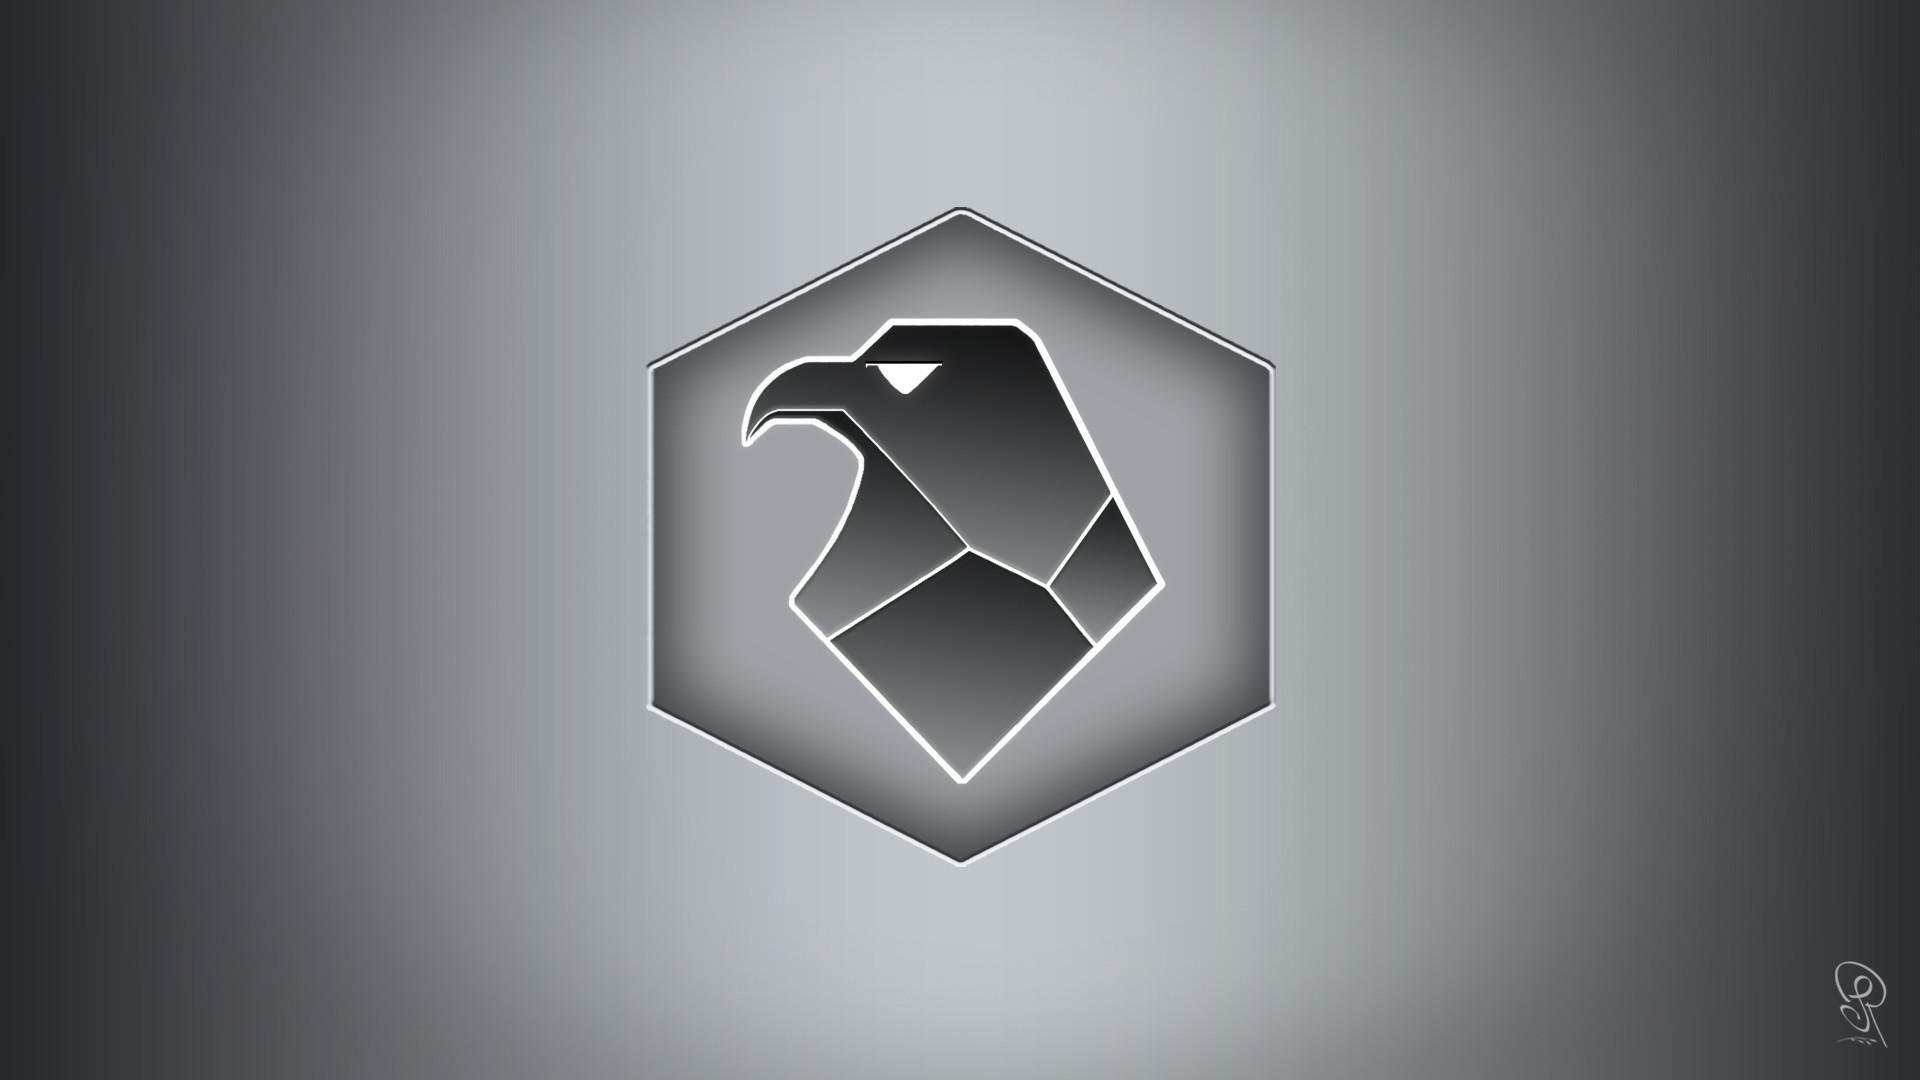 Res: 1920x1080, SC2 Wallpaper - Platinum league pride!